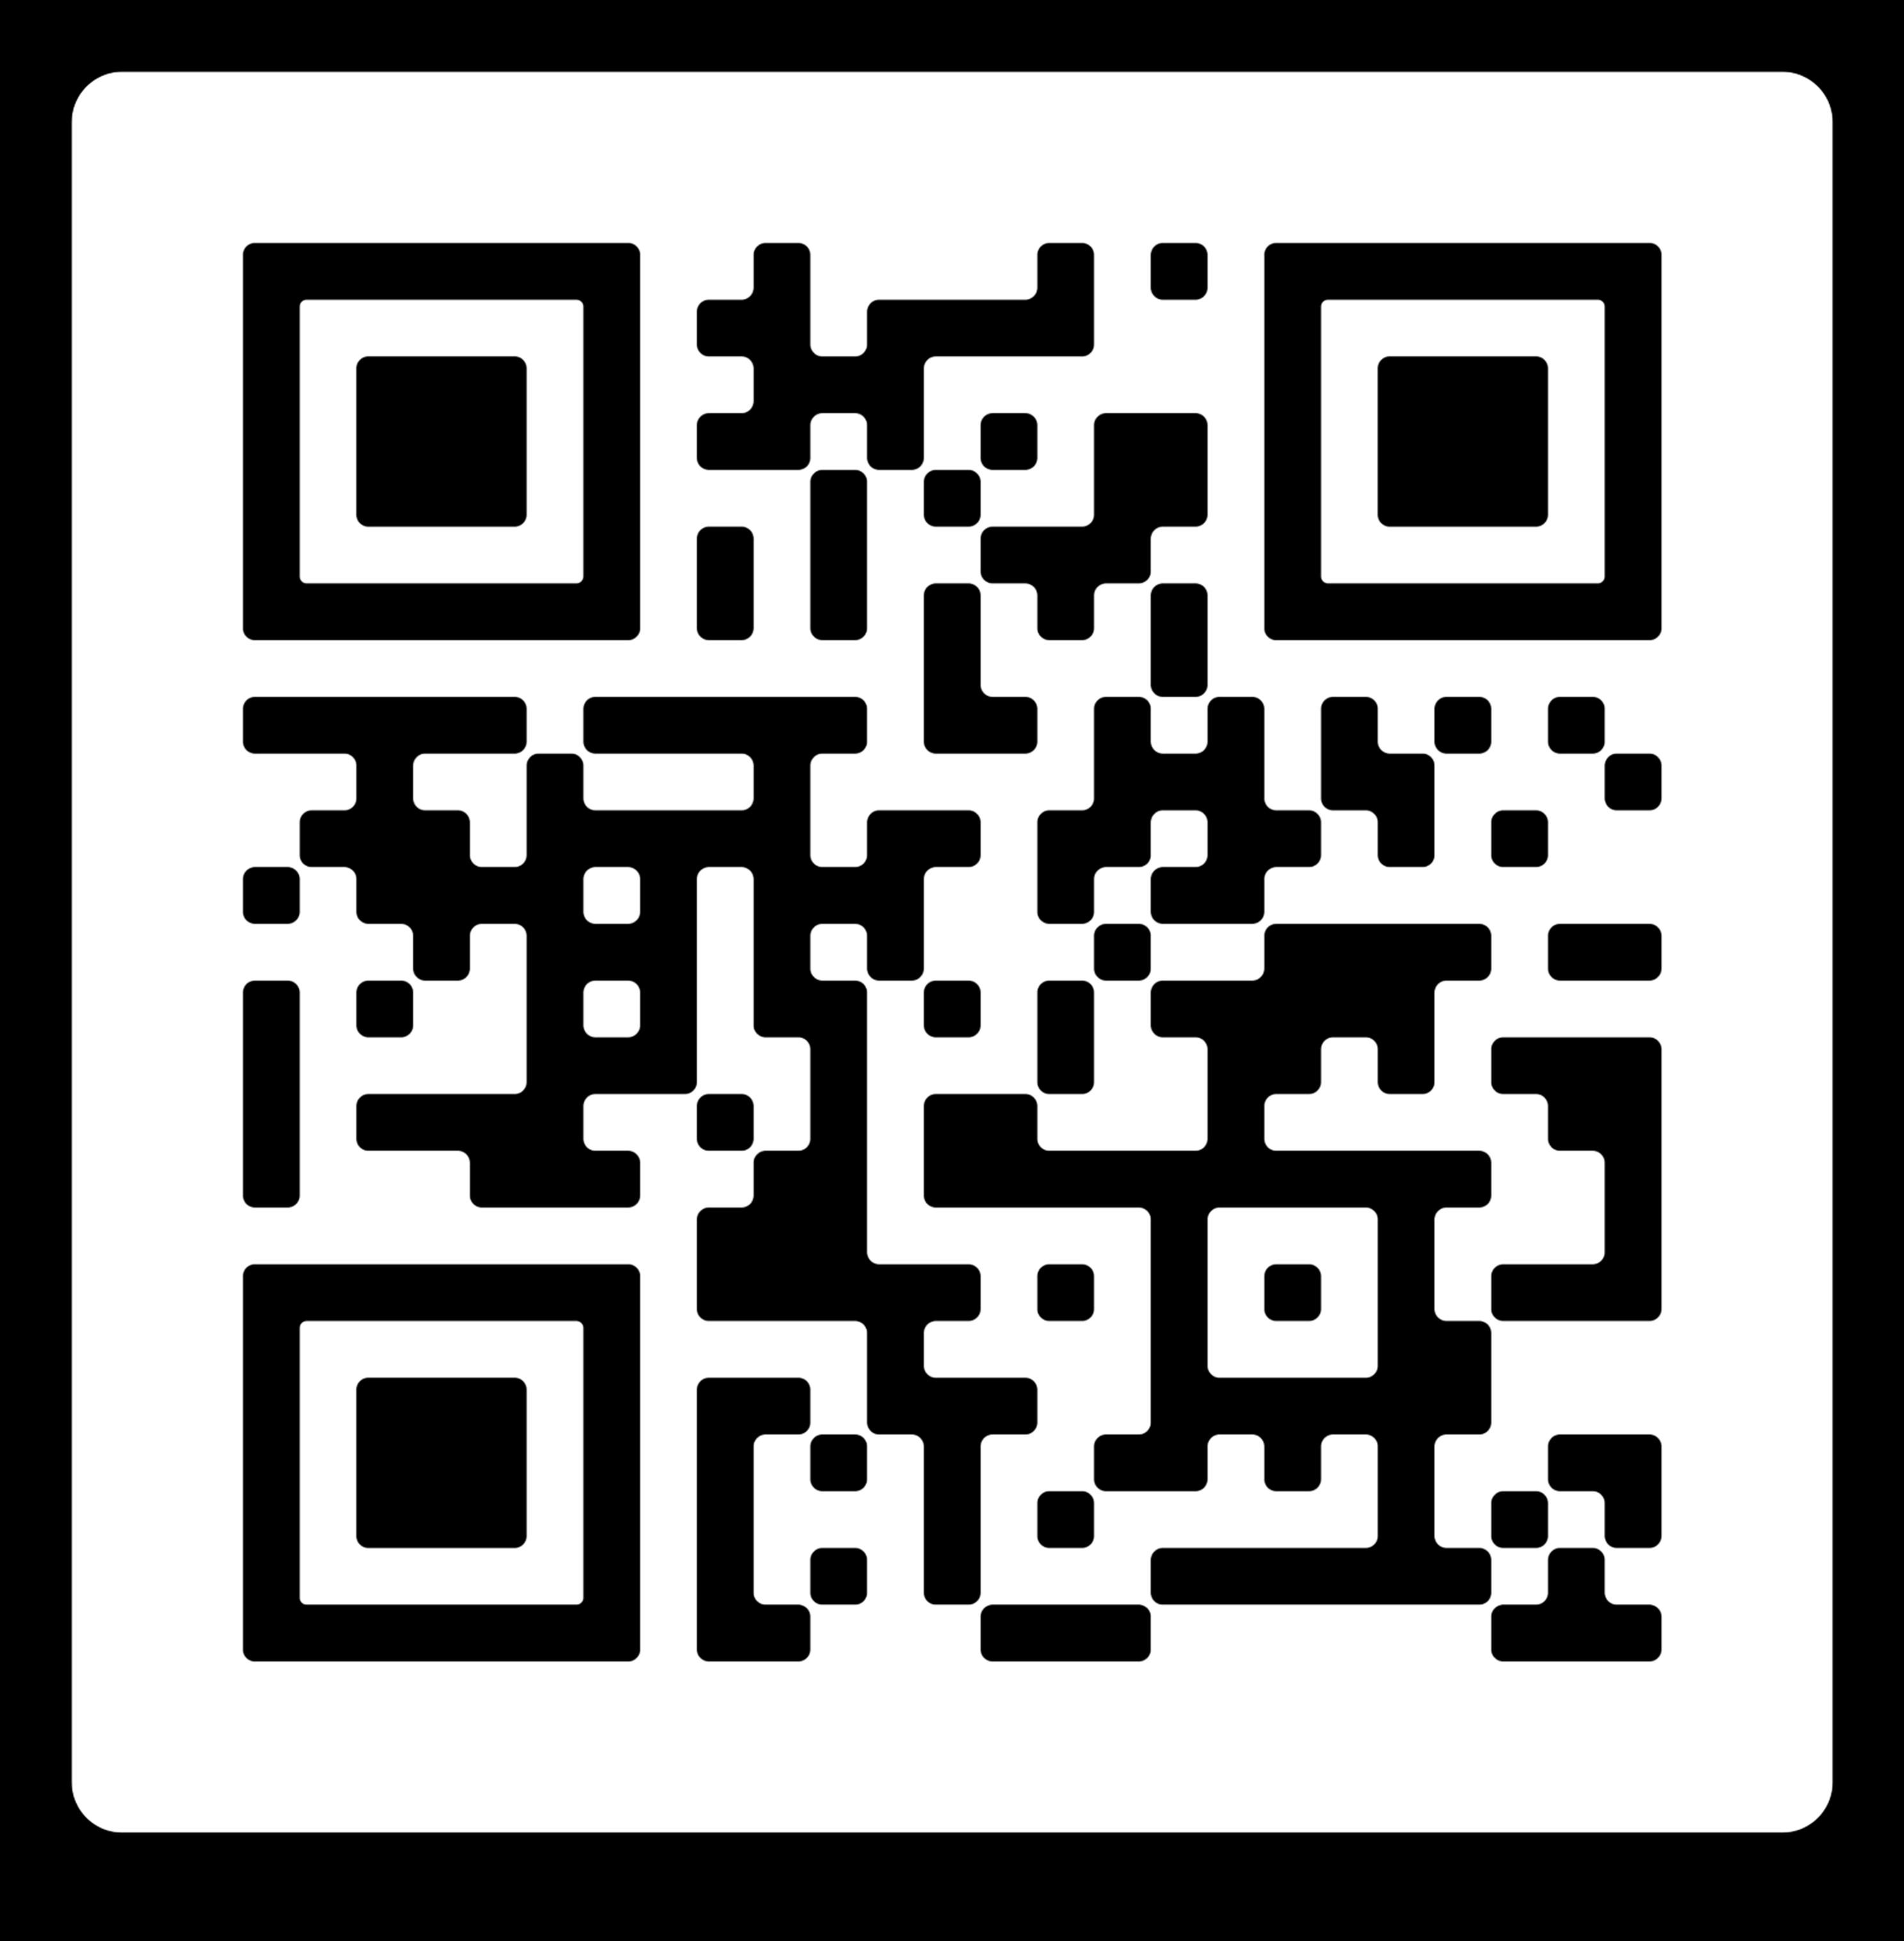 Code de chargement de l'application